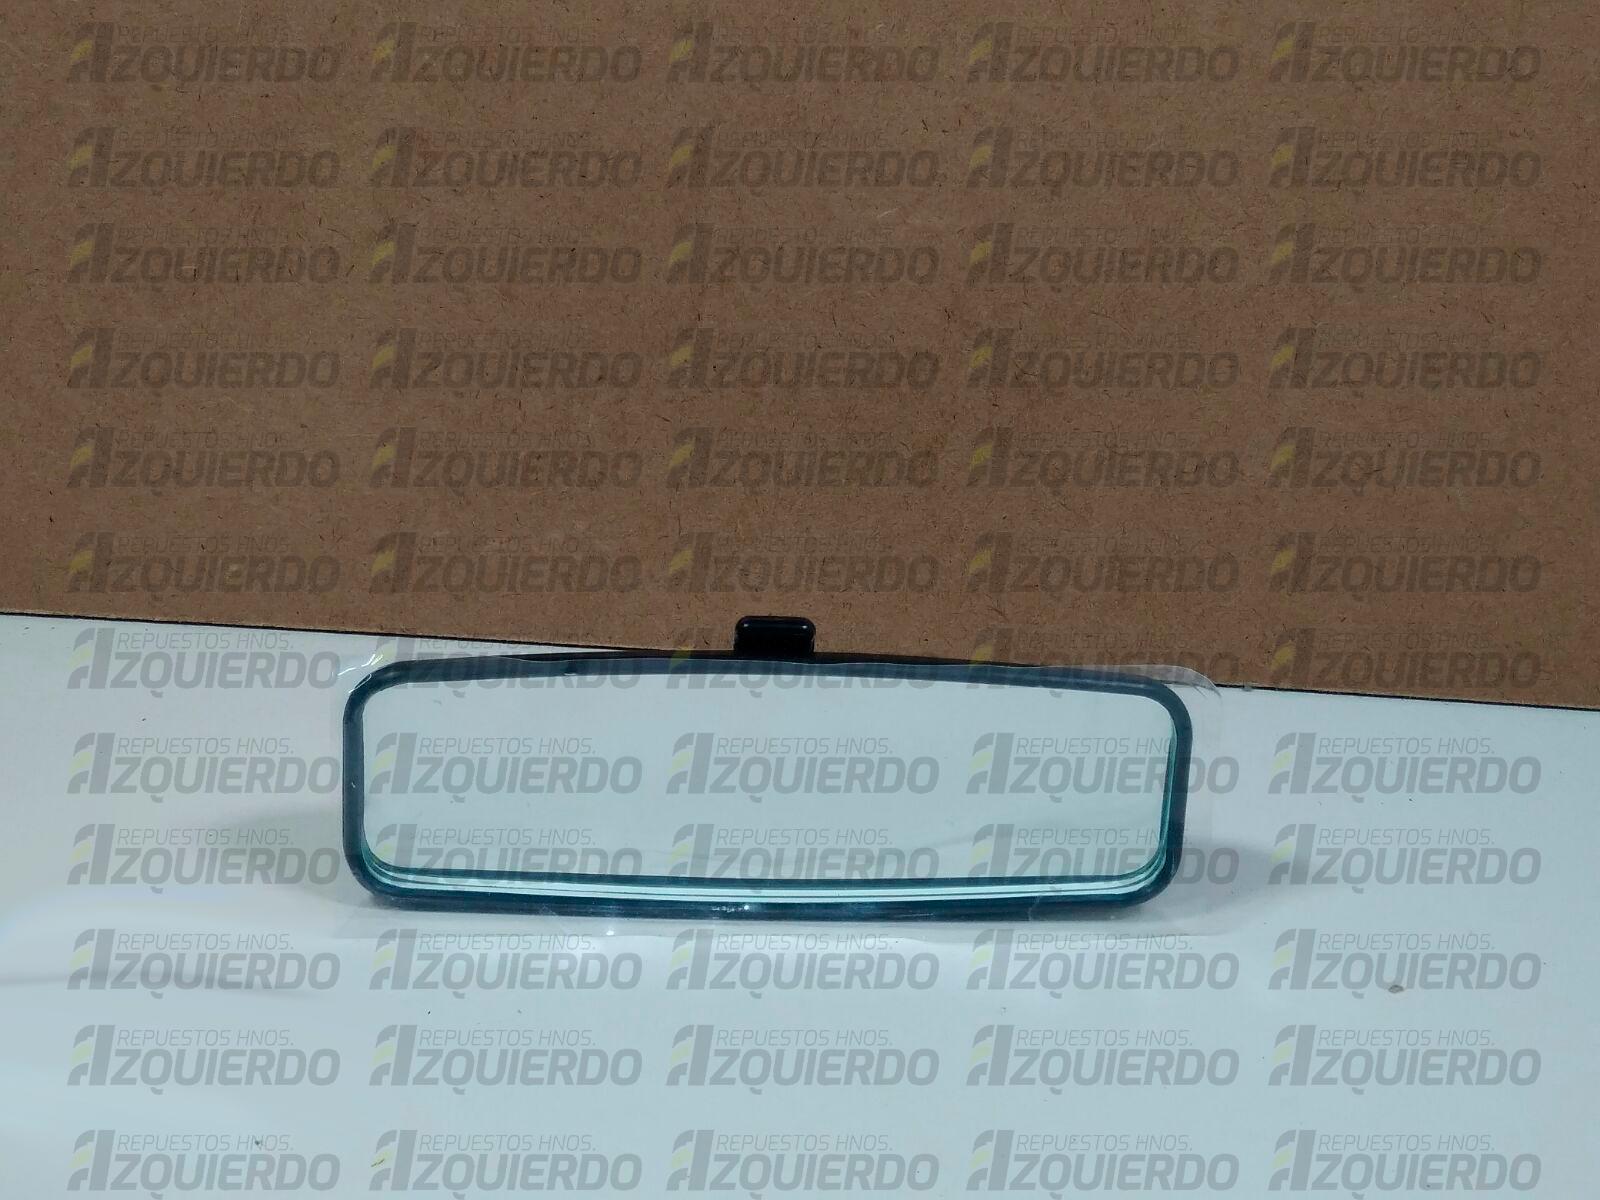 Espejo retrovisor adhesivo repuestos hermanos izquierdo for Espejo adhesivo